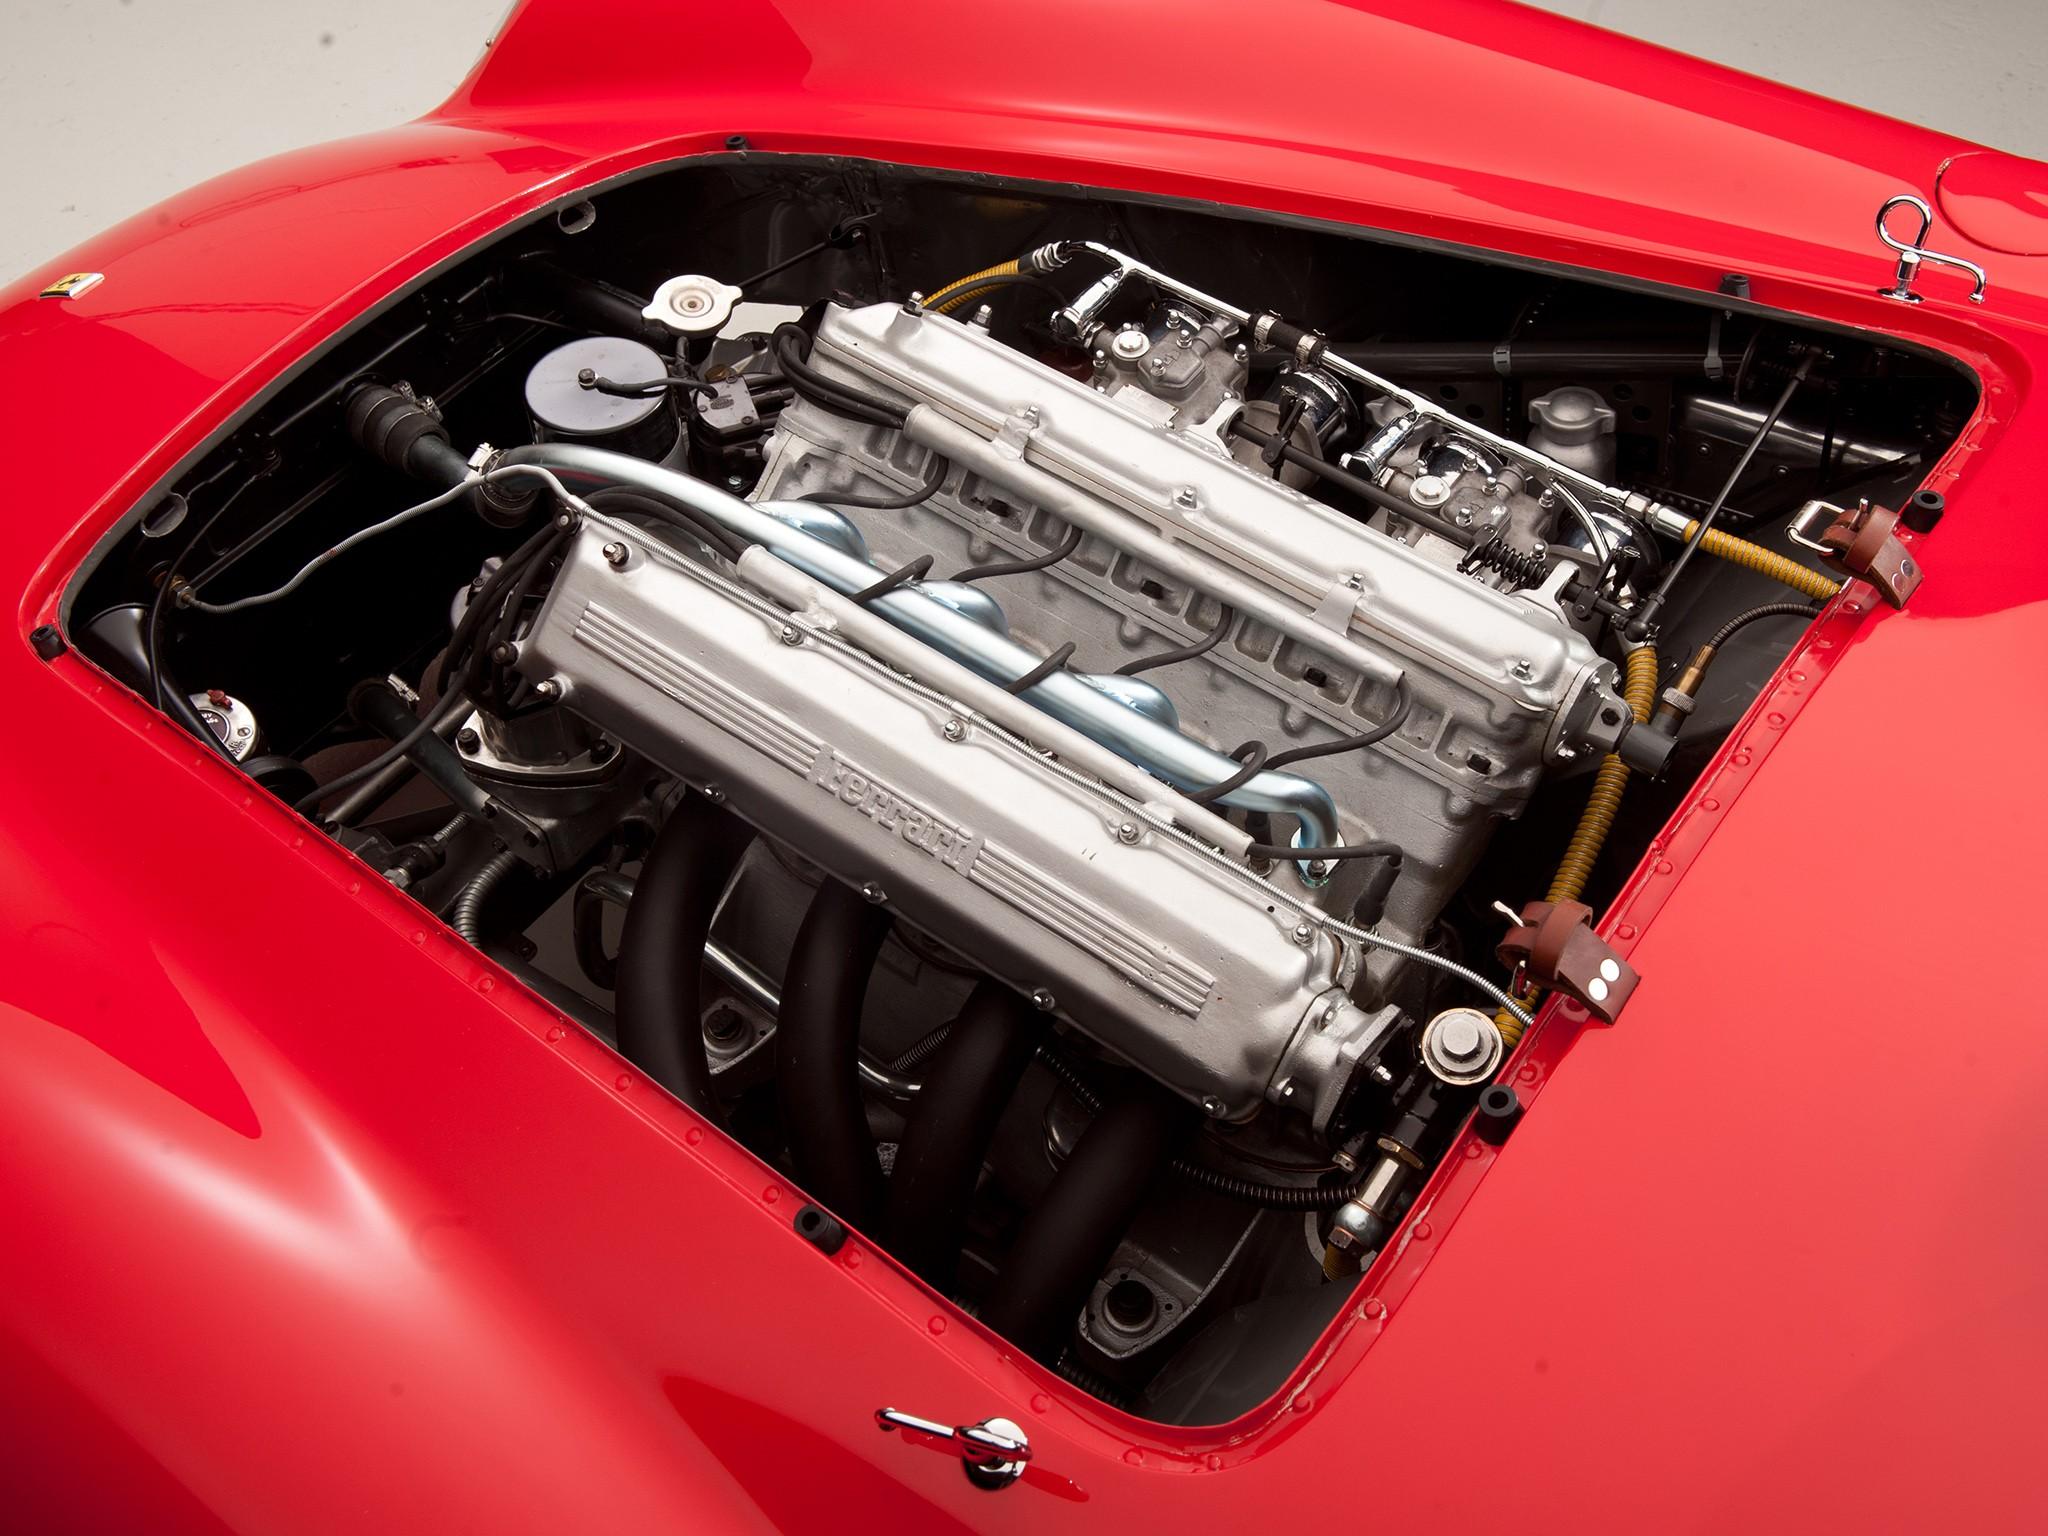 Ferrari 750 Monza двигатель